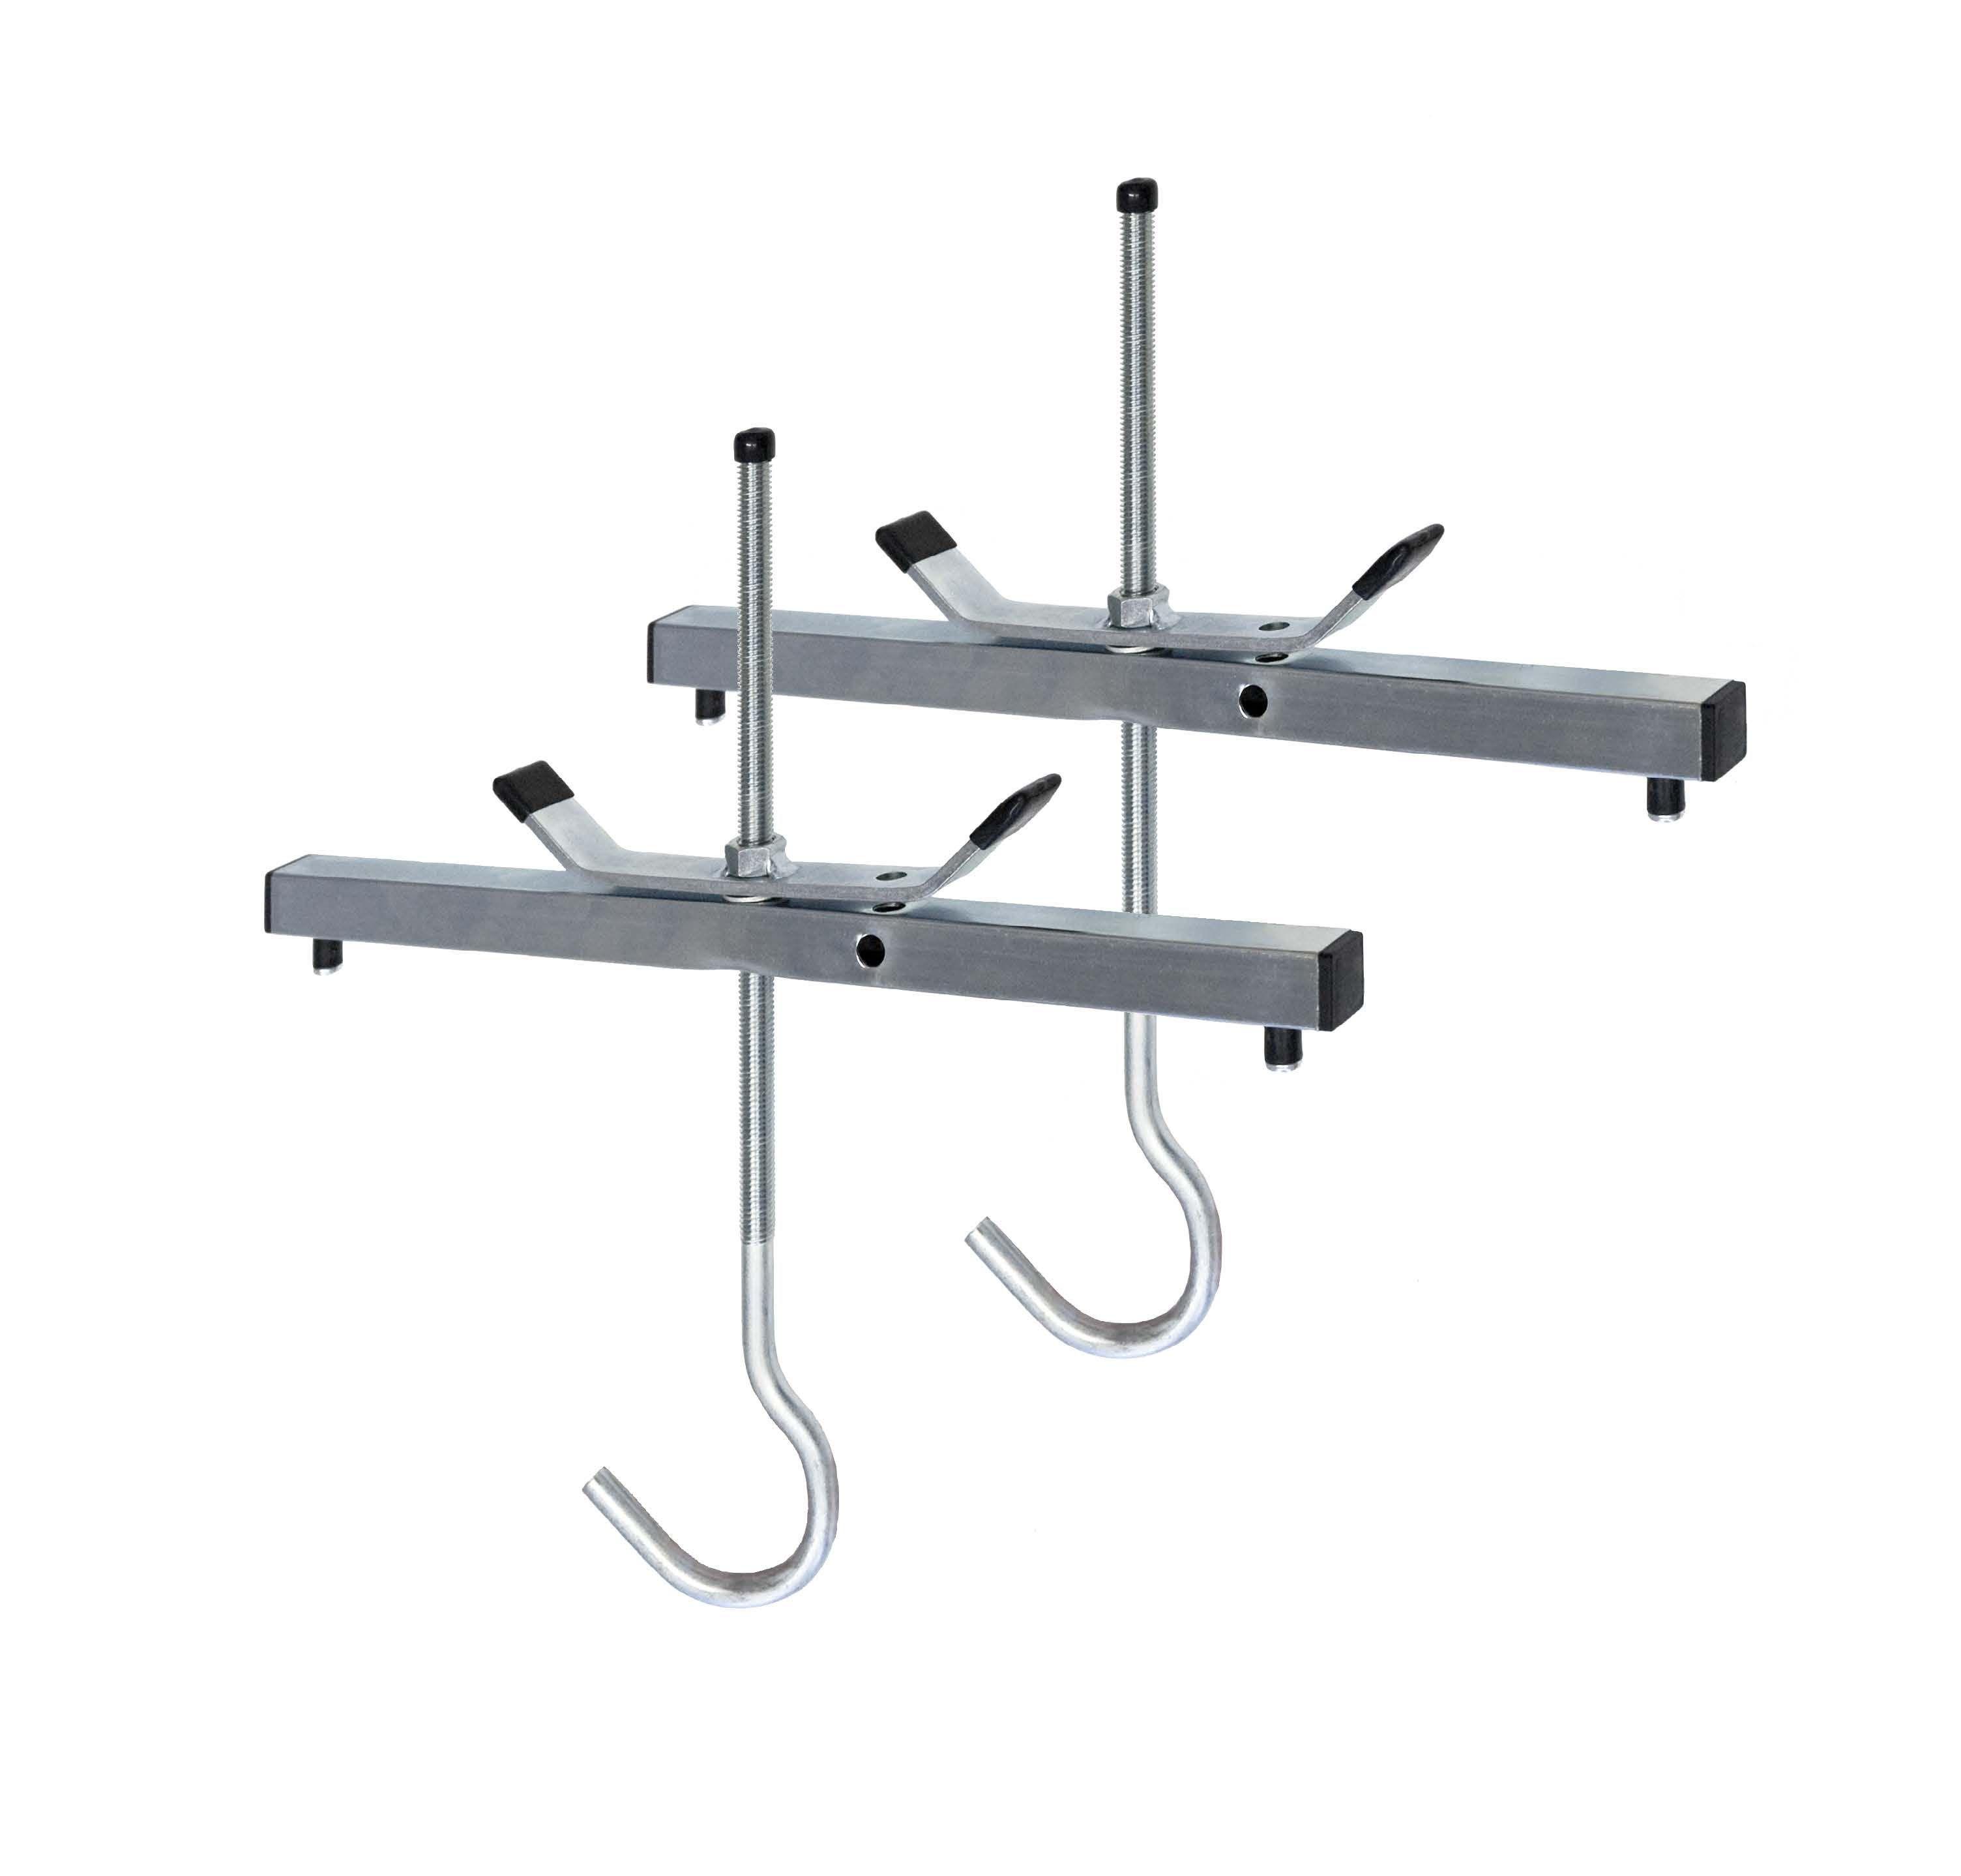 Ladder Roof Rack >> Mac Allister Ladder Roof Rack Clamp, (H)450mm | Departments | TradePoint